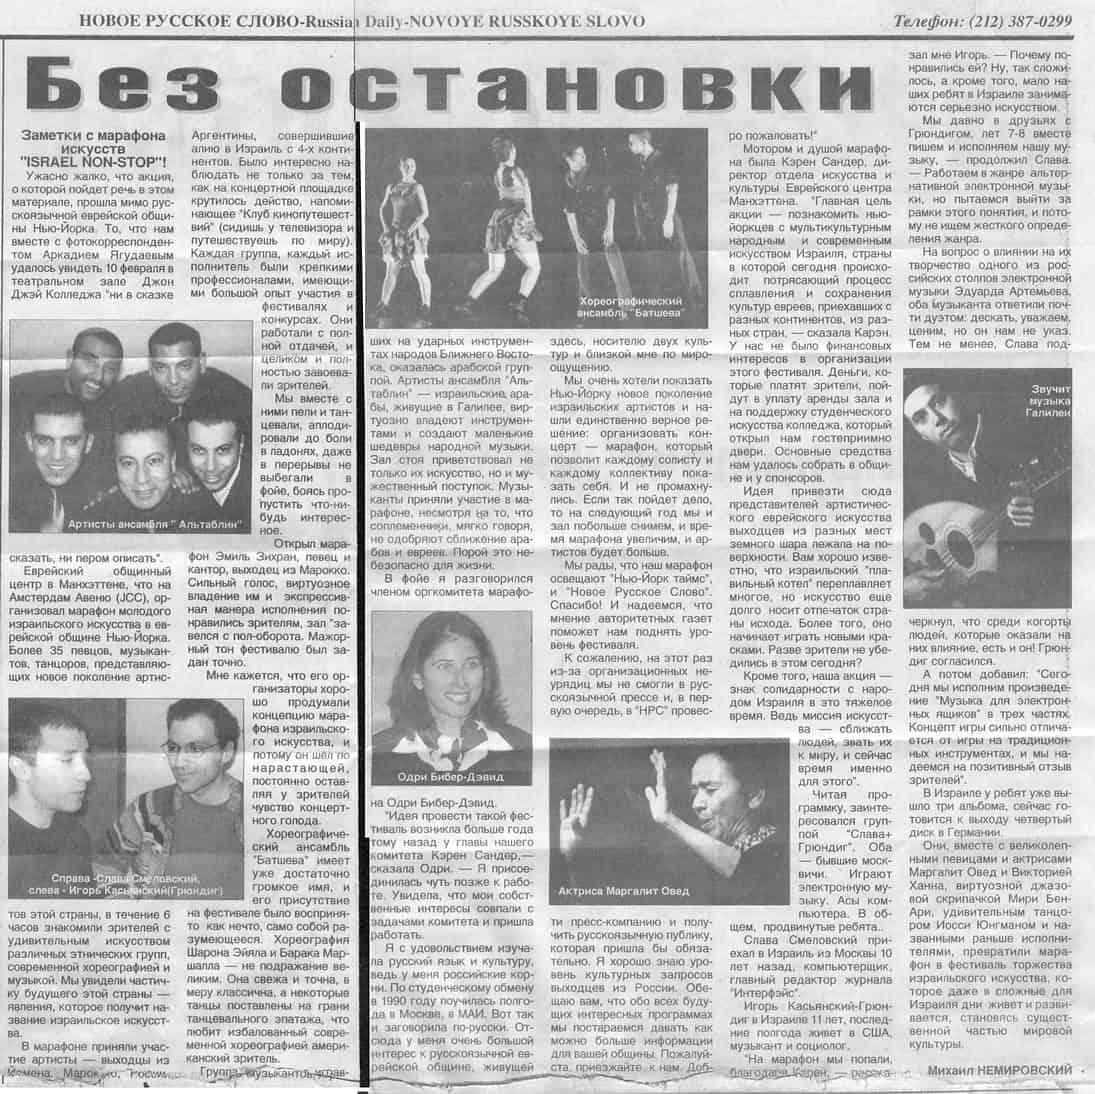 15 02 02 - Novoe Russkoe Slovo, Israel Non-Stop festival